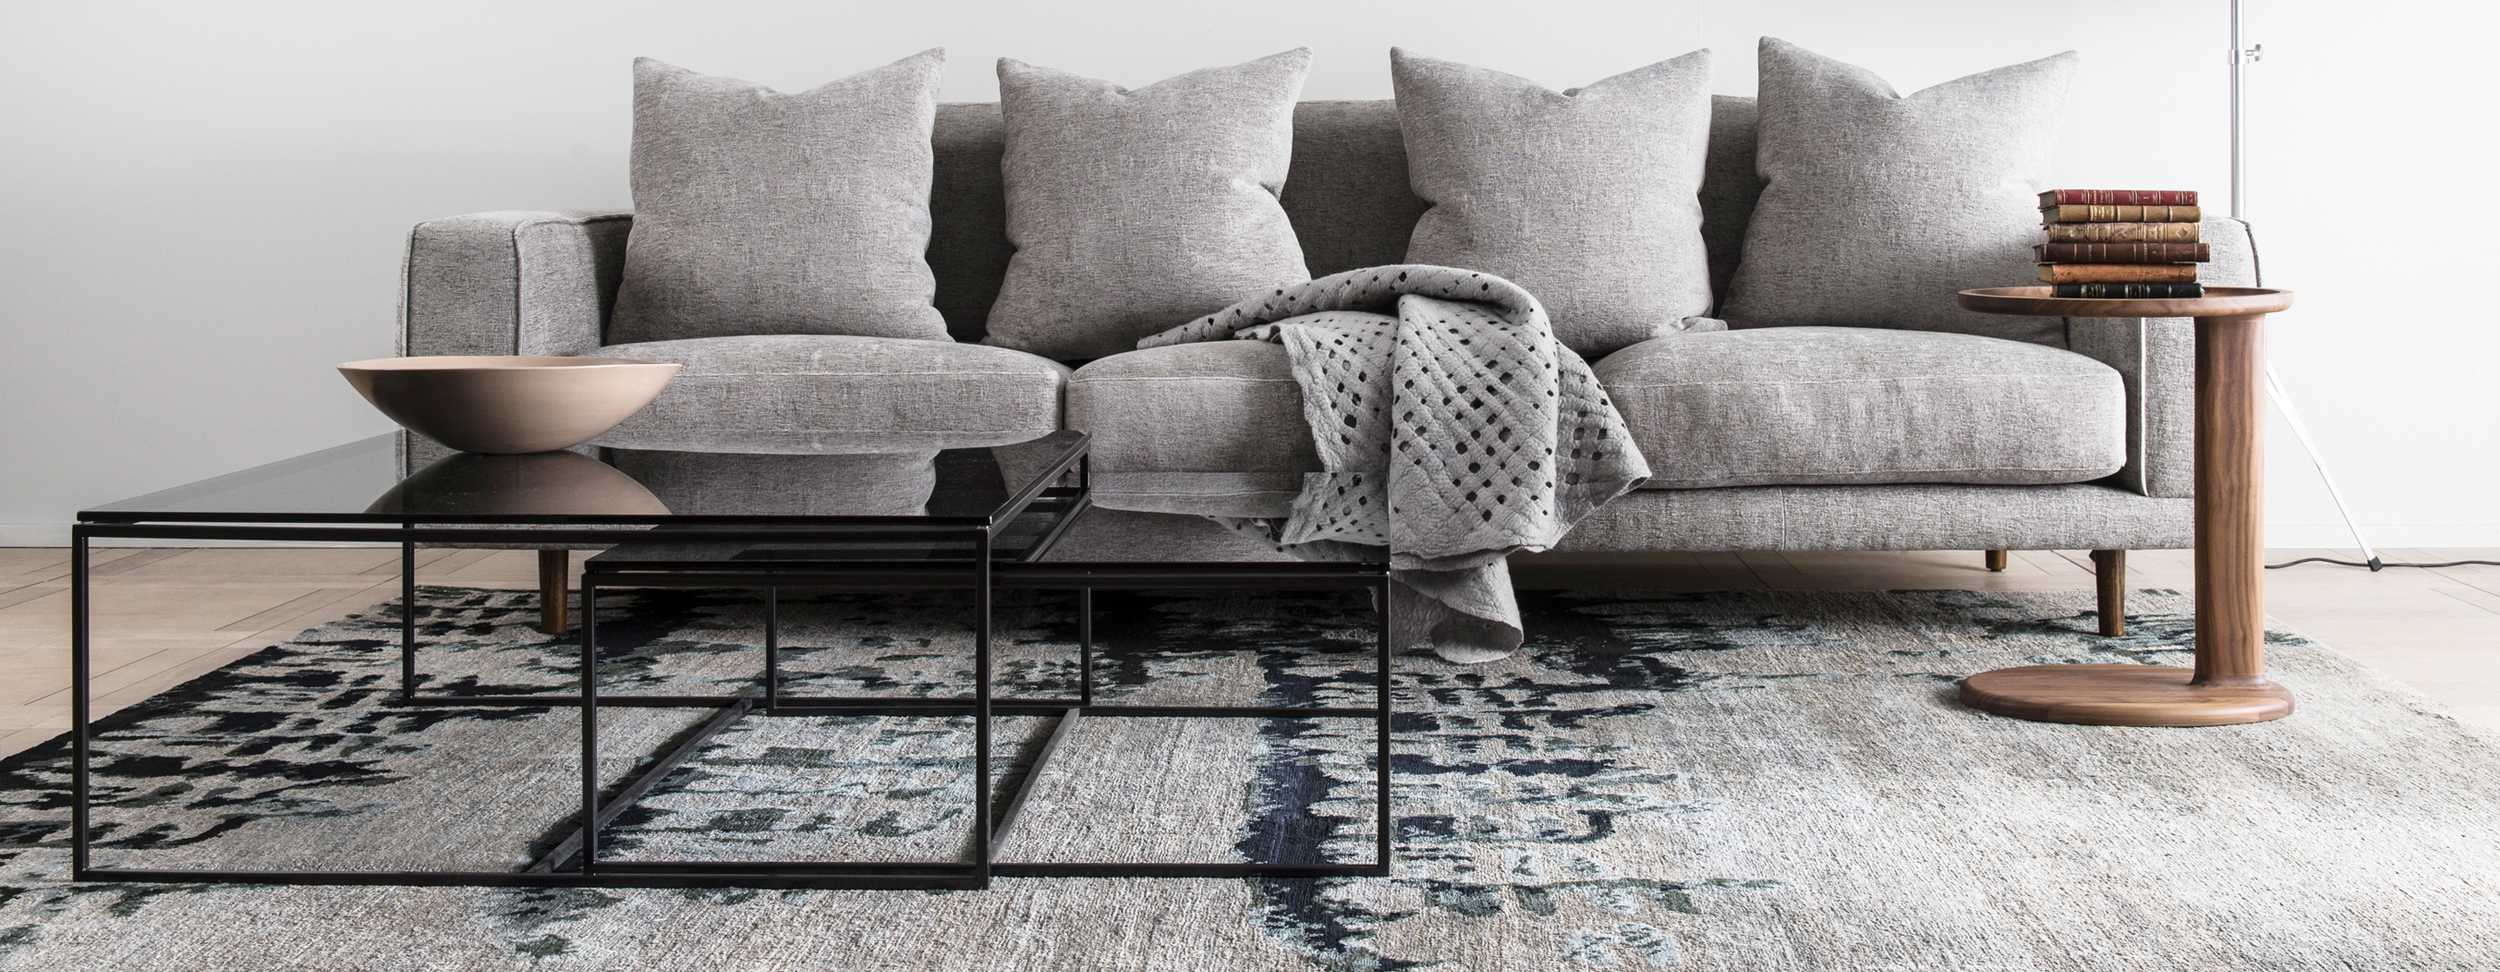 Designer Coffee Tables Sydney Amp Melbourne Fanuli Furniture